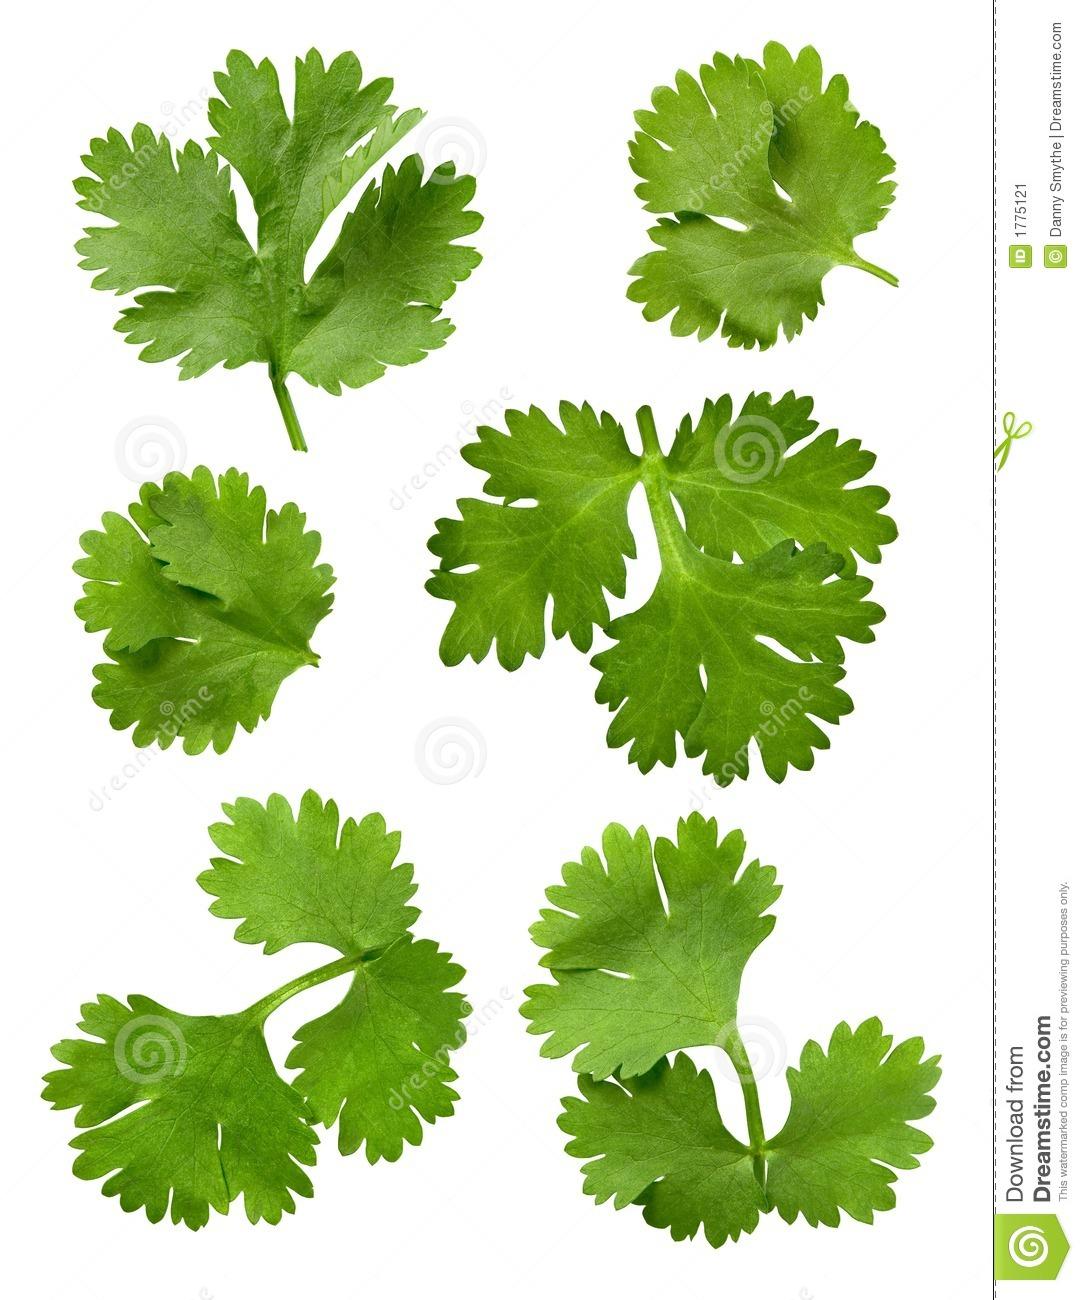 Cilantro (Parsley) stock image. Image of taste, vitamin.